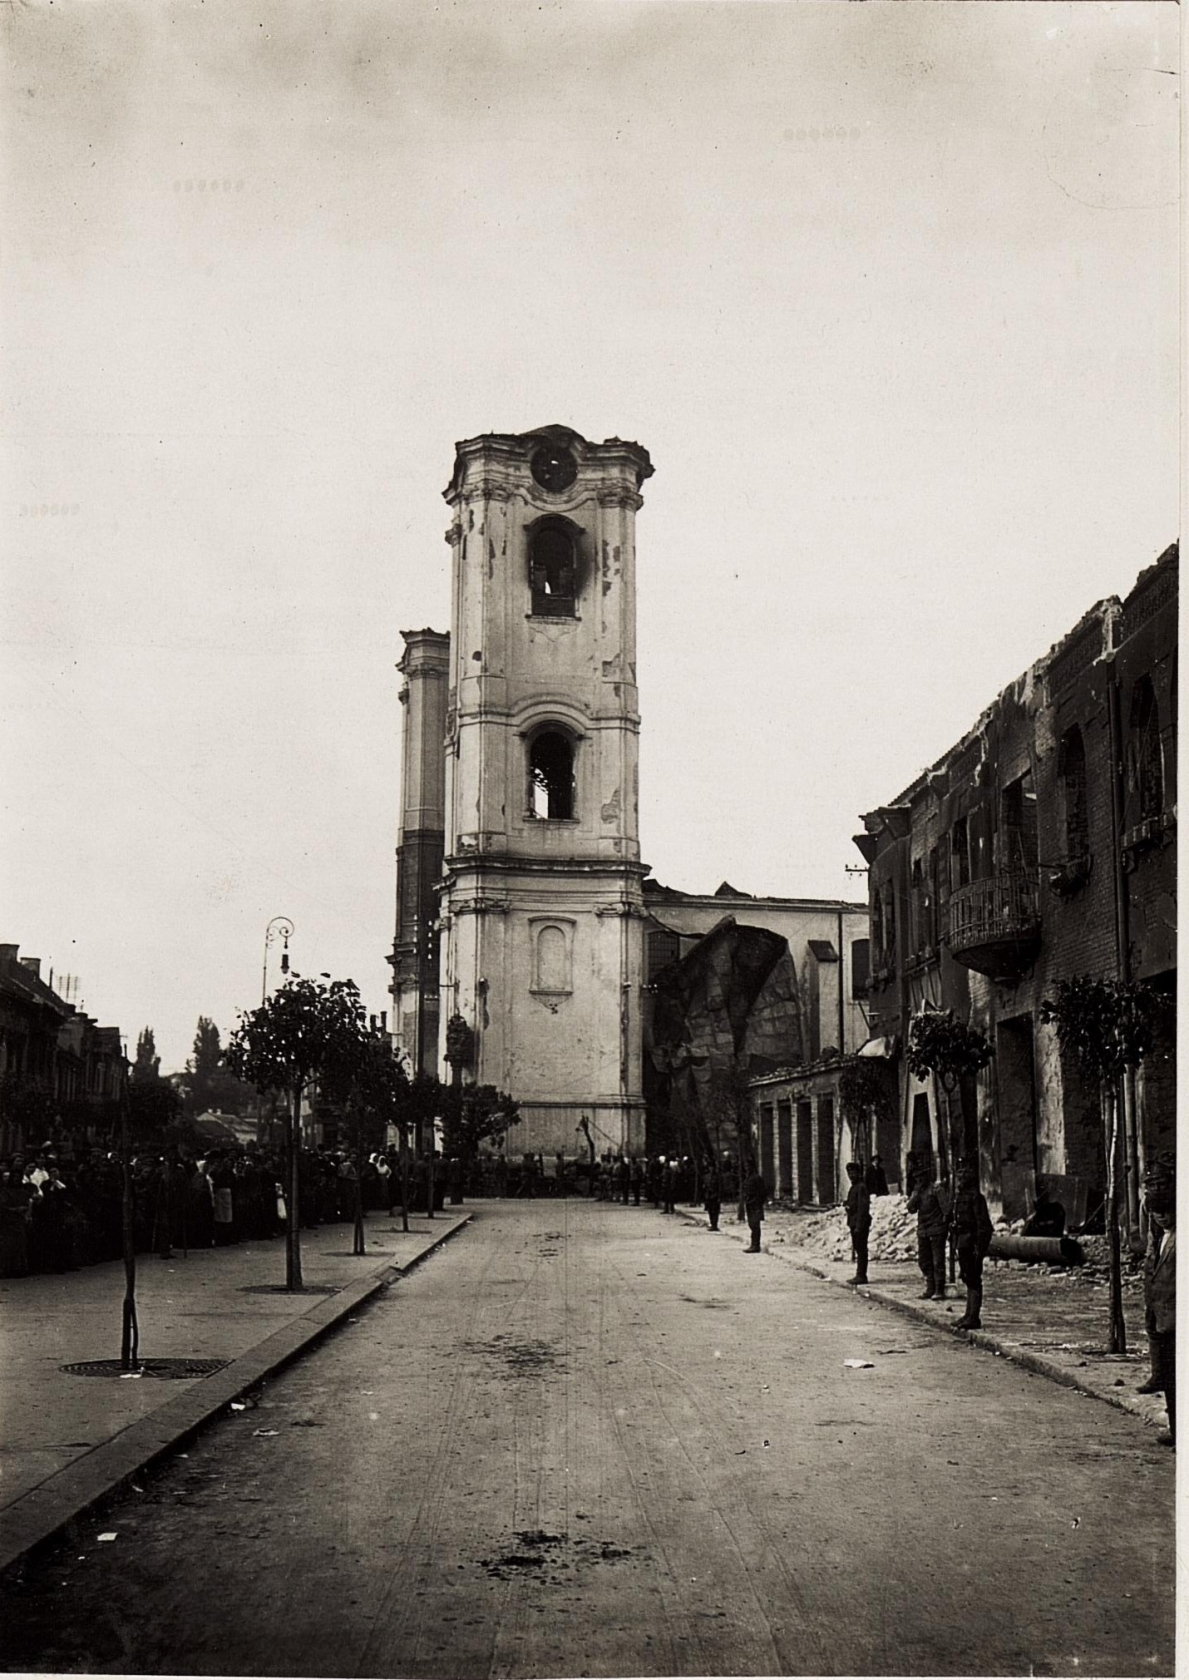 A Szent Bertalan templom a Hanisz térrel. 1917. május 23. Kép: K.u.k. Kriegspressequartier, Lichtbildstelle - Wien - https://www.bildarchivaustria.at / Wikipedia Commons